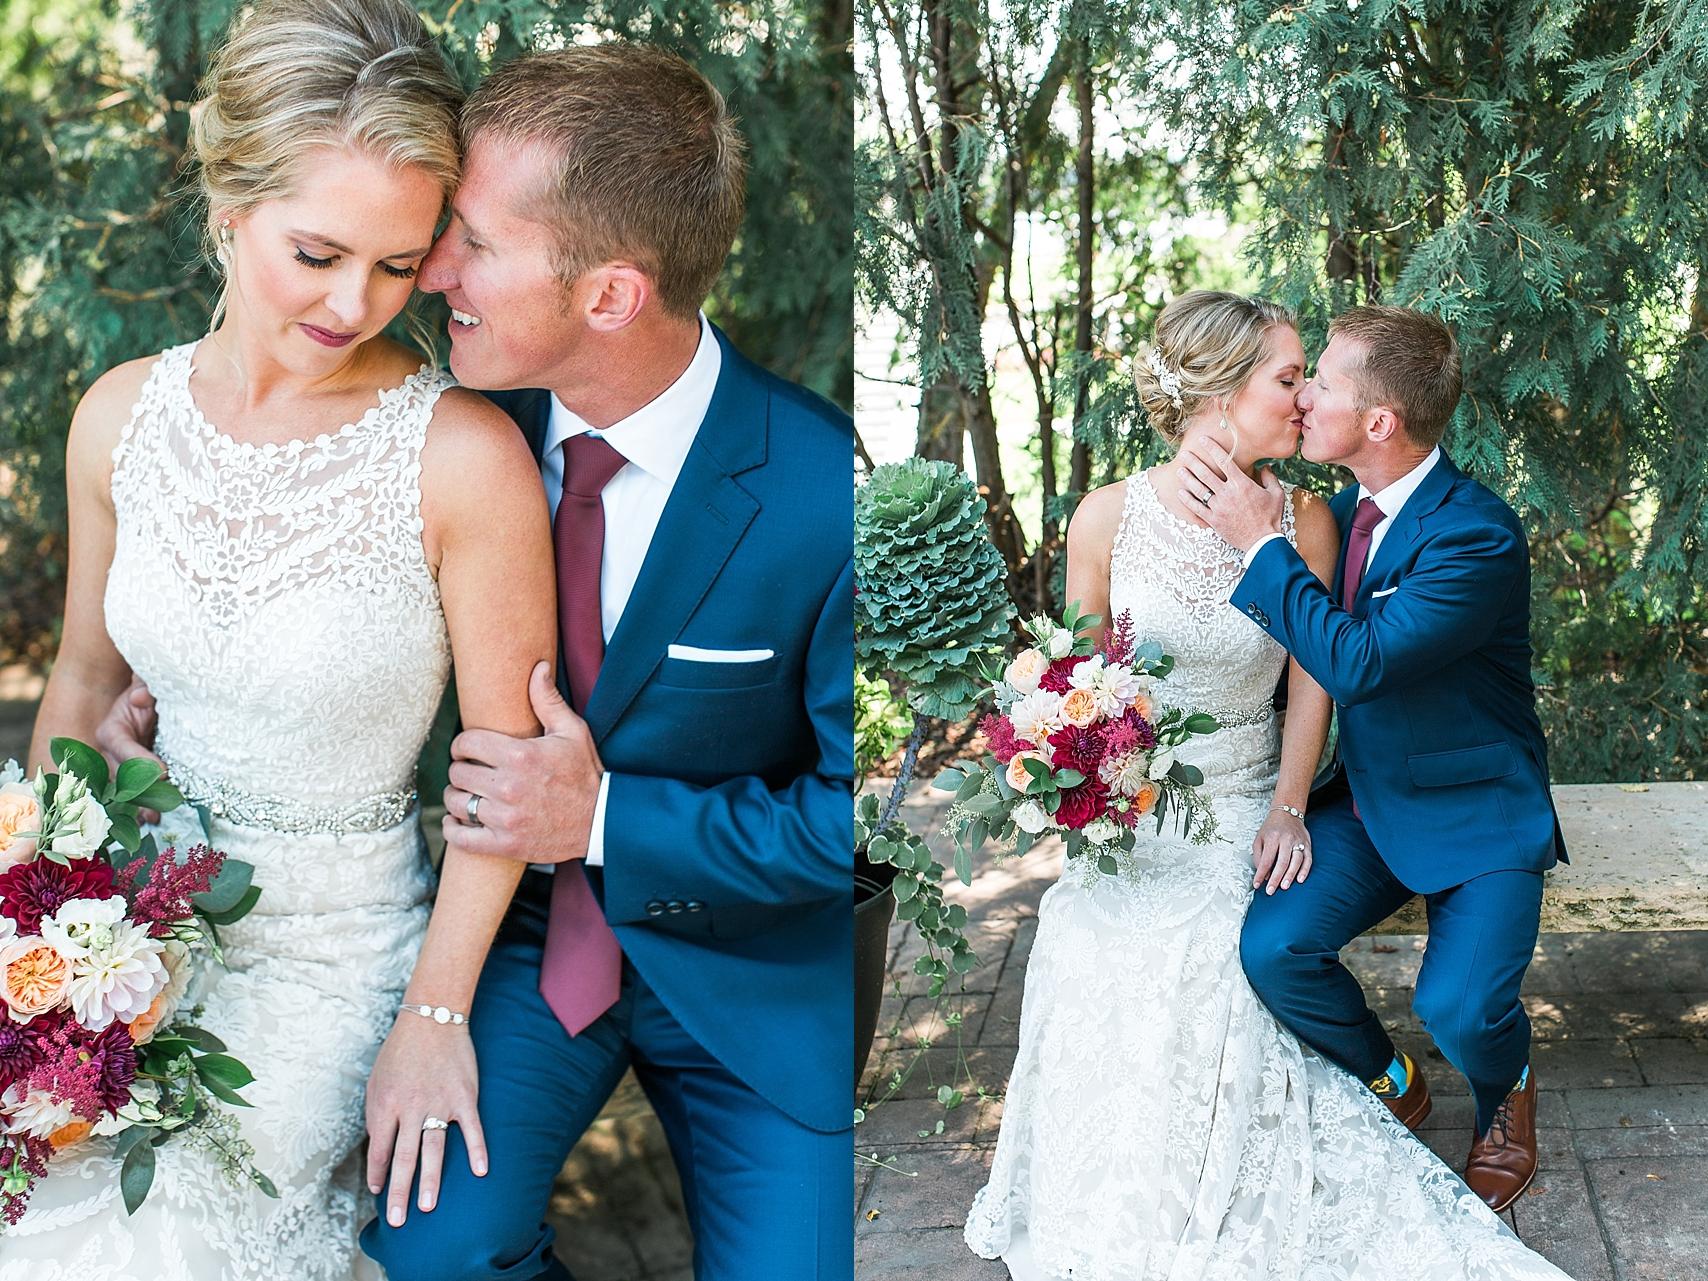 Minnesota Minneapolis Wedding Photographer Best Of 2018 Weddings Mallory Kiesow Photography_0086.jpg